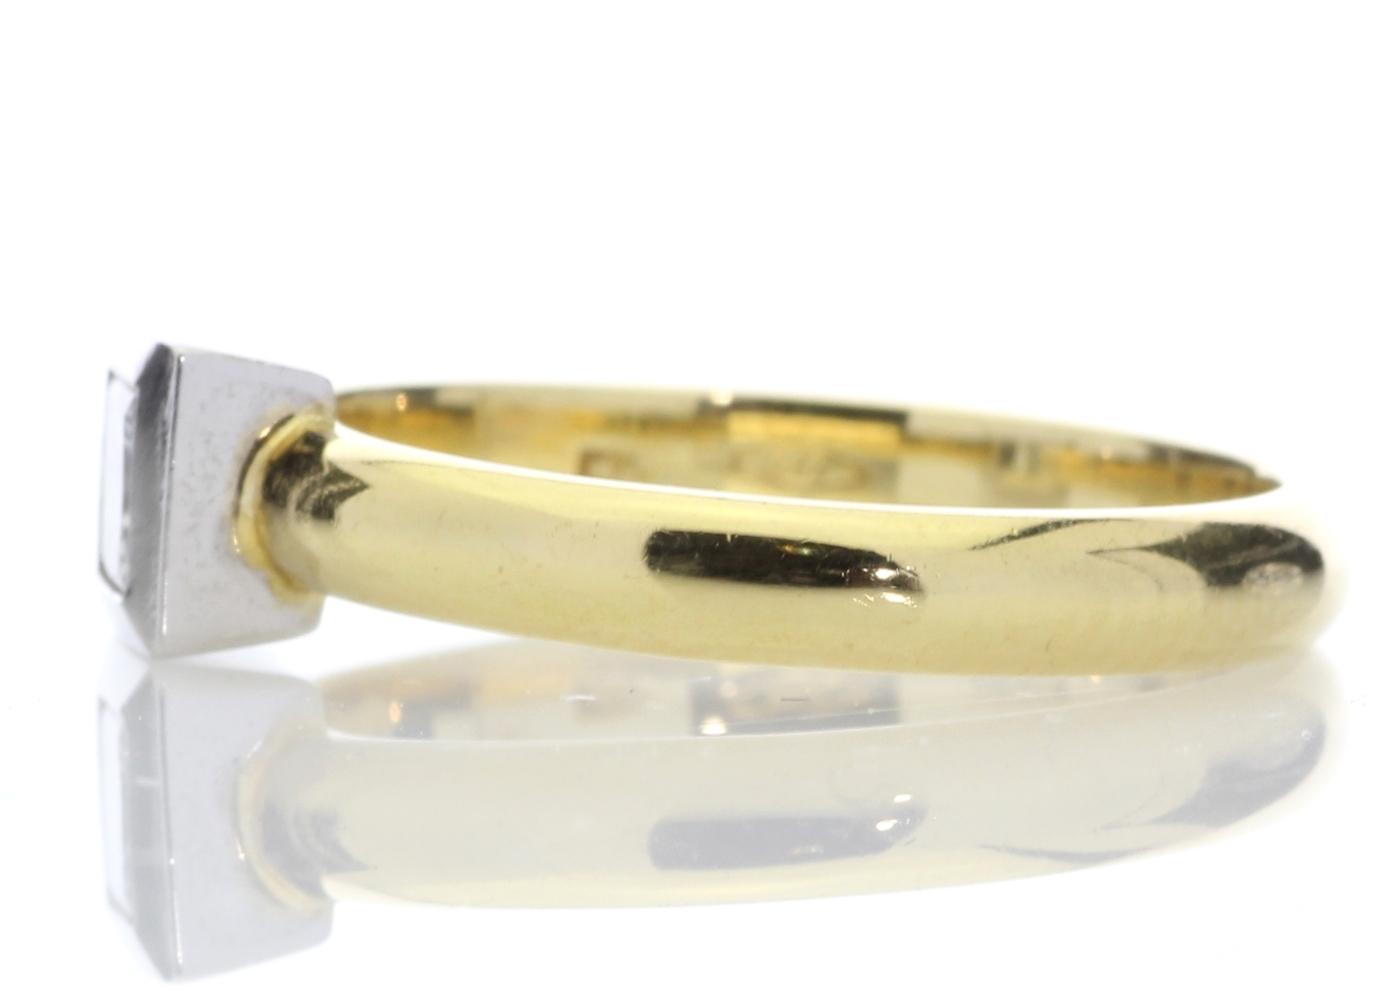 18ct Princess Cut Rub Over Diamond Ring 0.45 Carats - Image 3 of 8